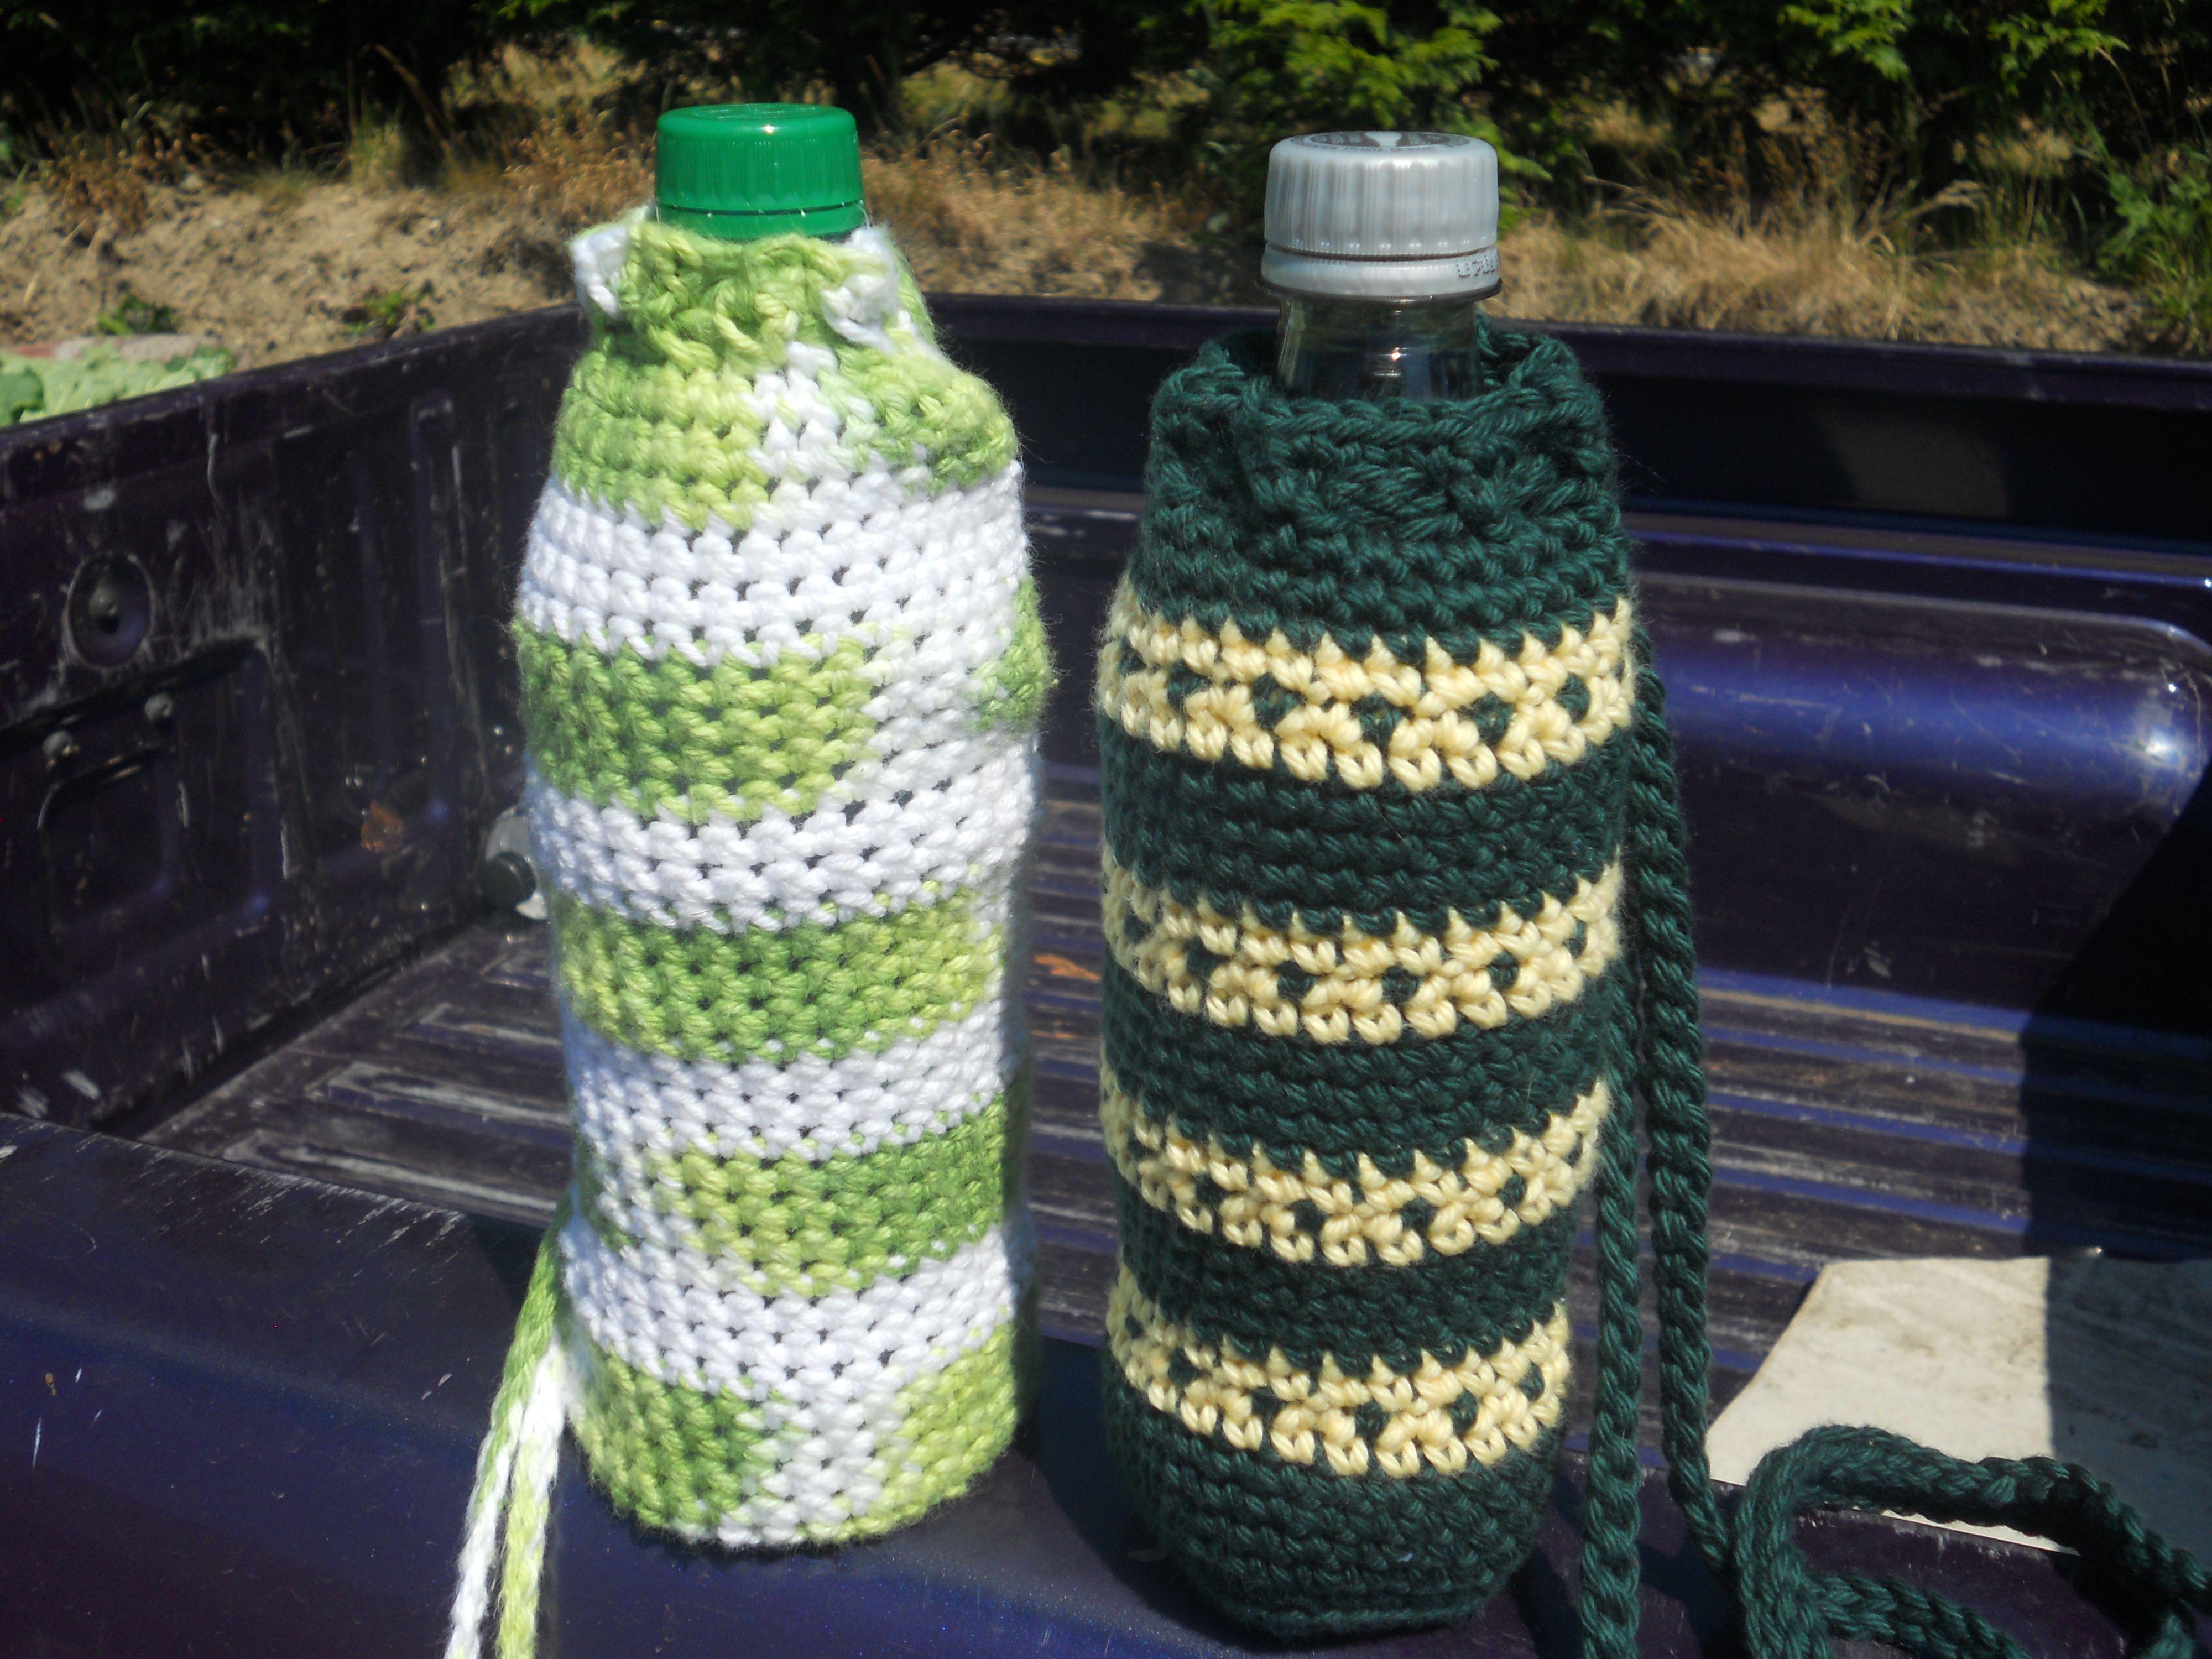 Water bottle holders anastaciaknits free pattern crochet water bottle holders anastaciaknits free pattern bankloansurffo Choice Image